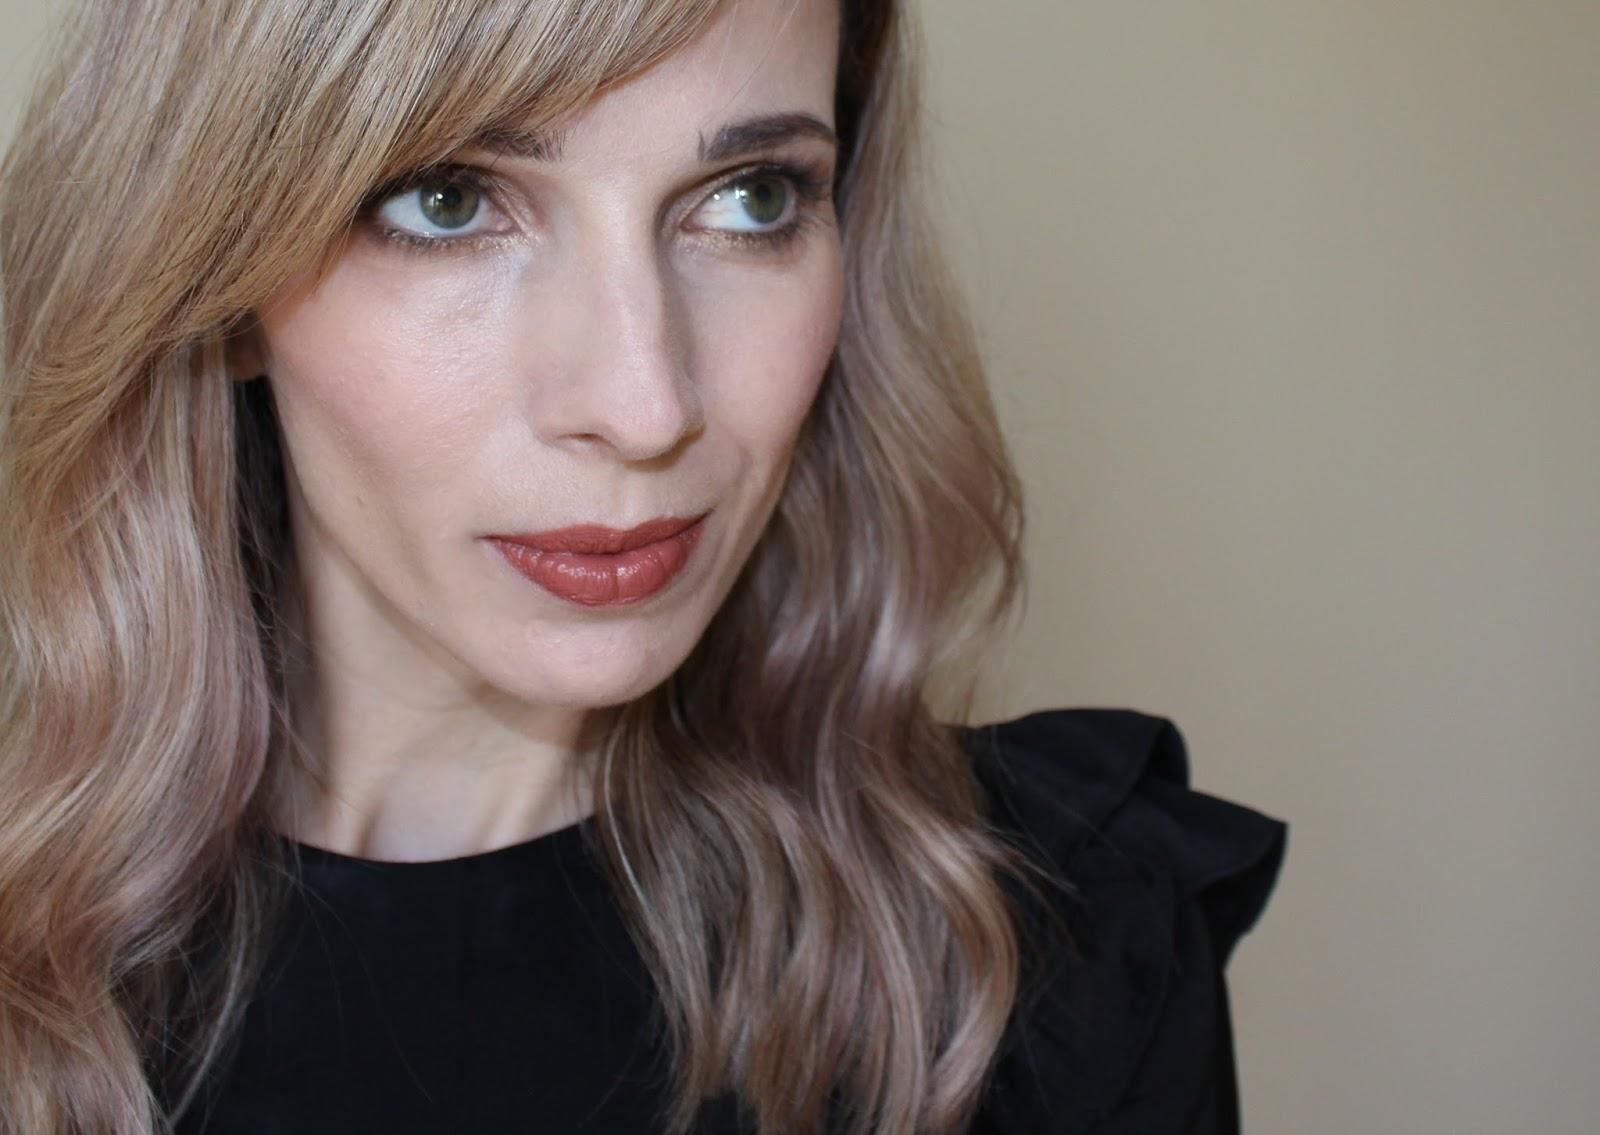 Emma Stone Oscars Inspired Makeup Look - 3